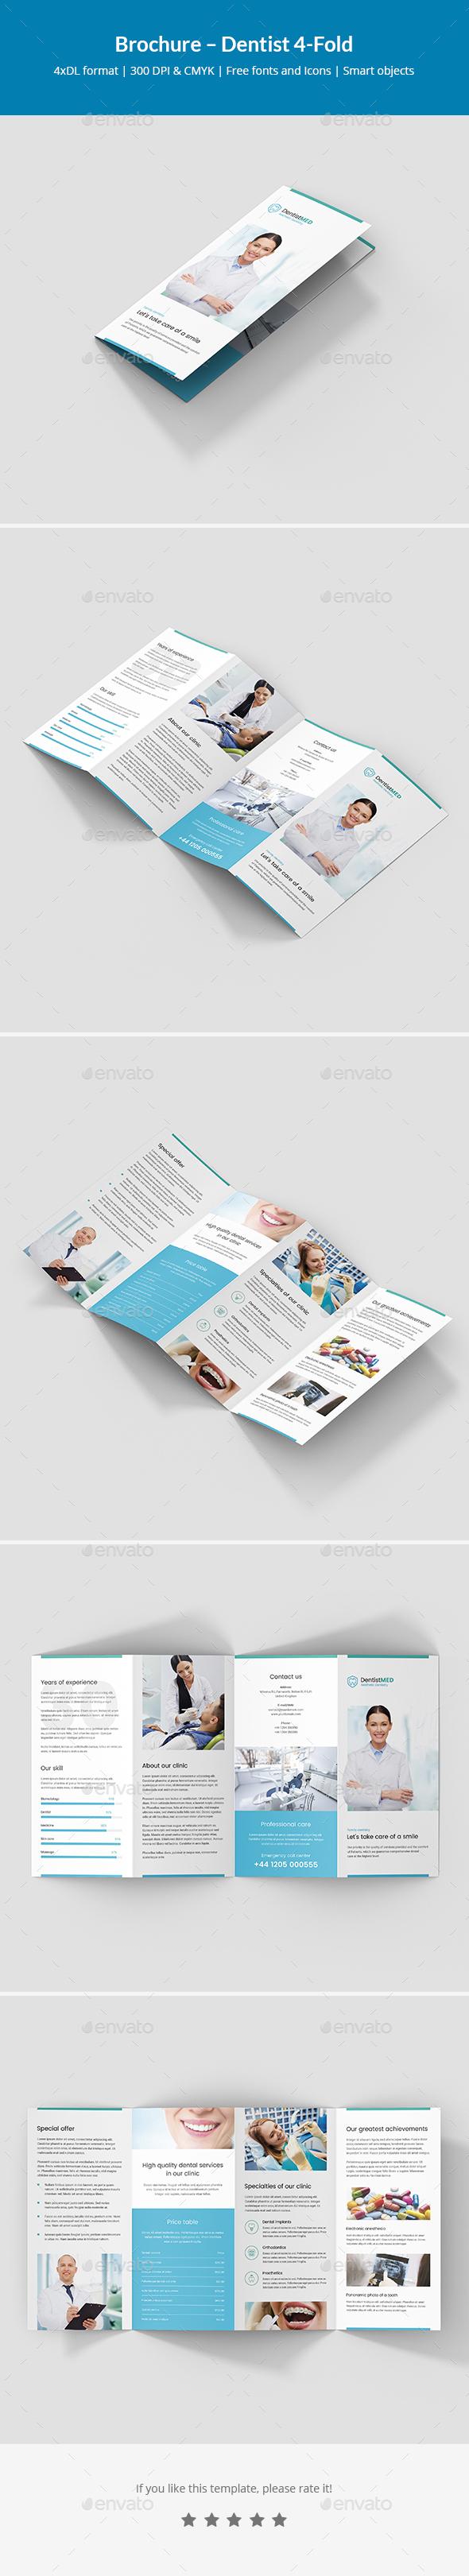 Brochure – Dentist 4-Fold - Informational Brochures